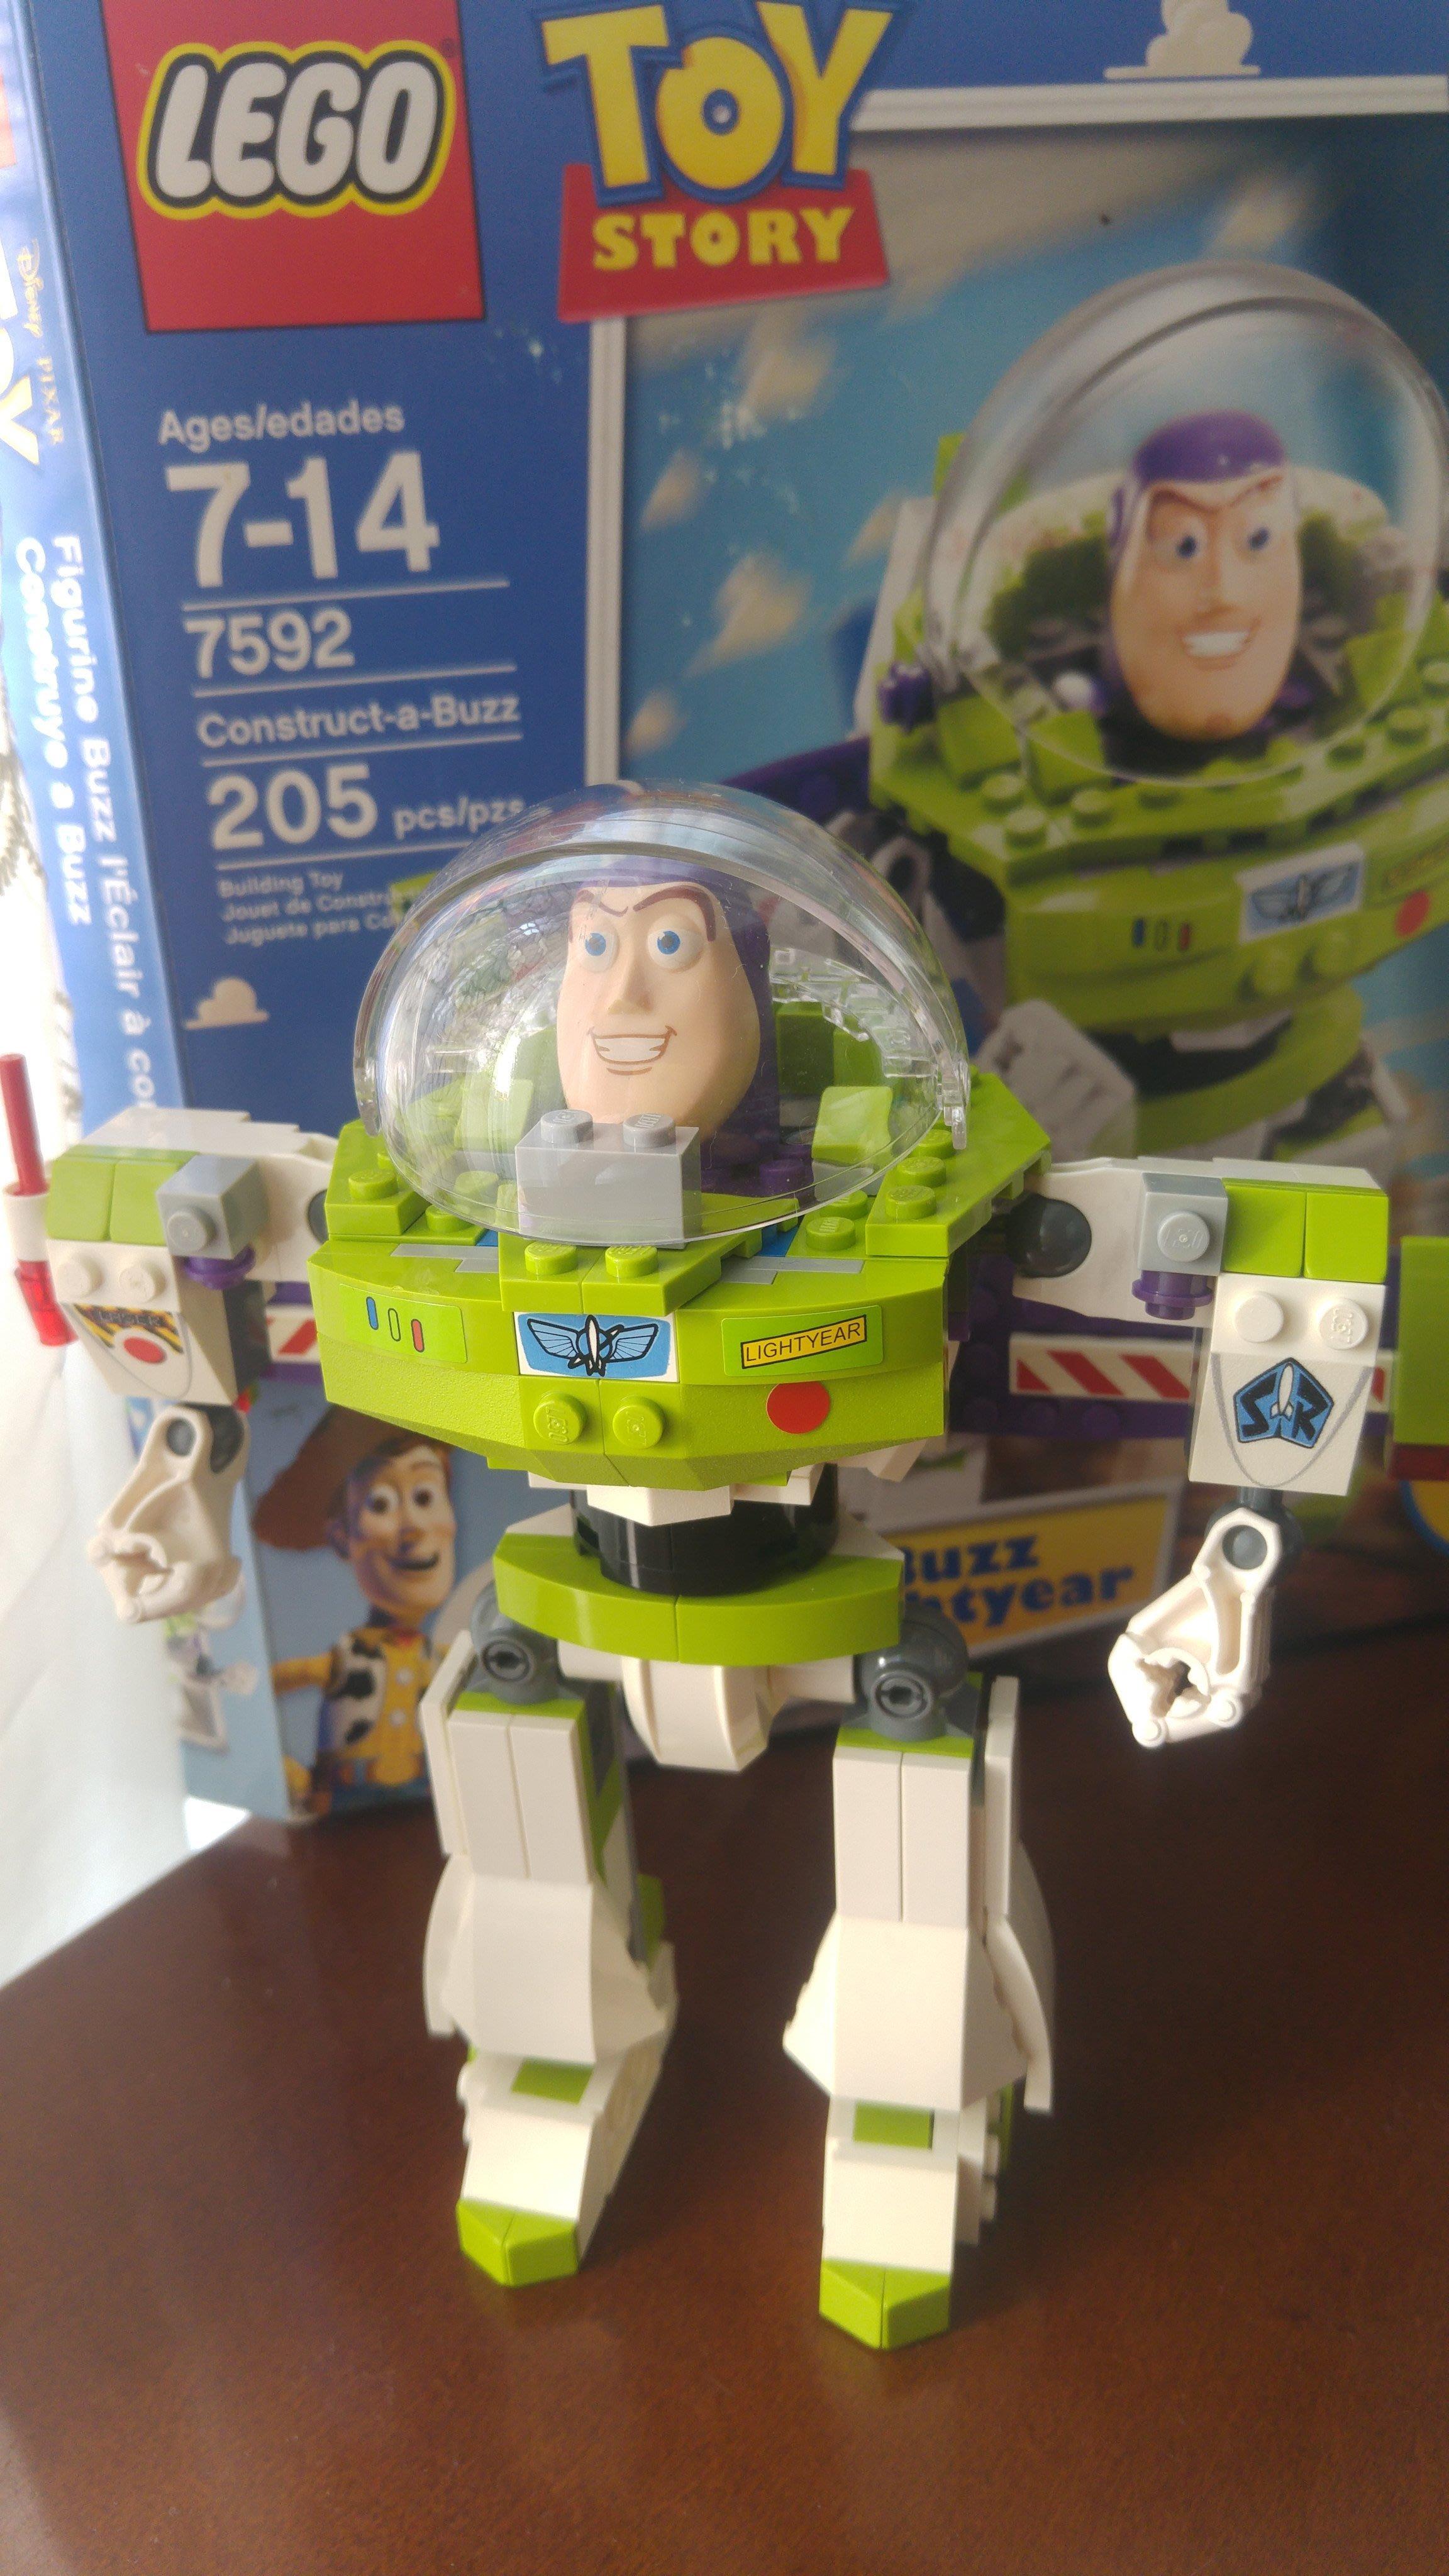 2010 絕版LEGO NO 7592 Construct-a-Buzz 巴斯光年